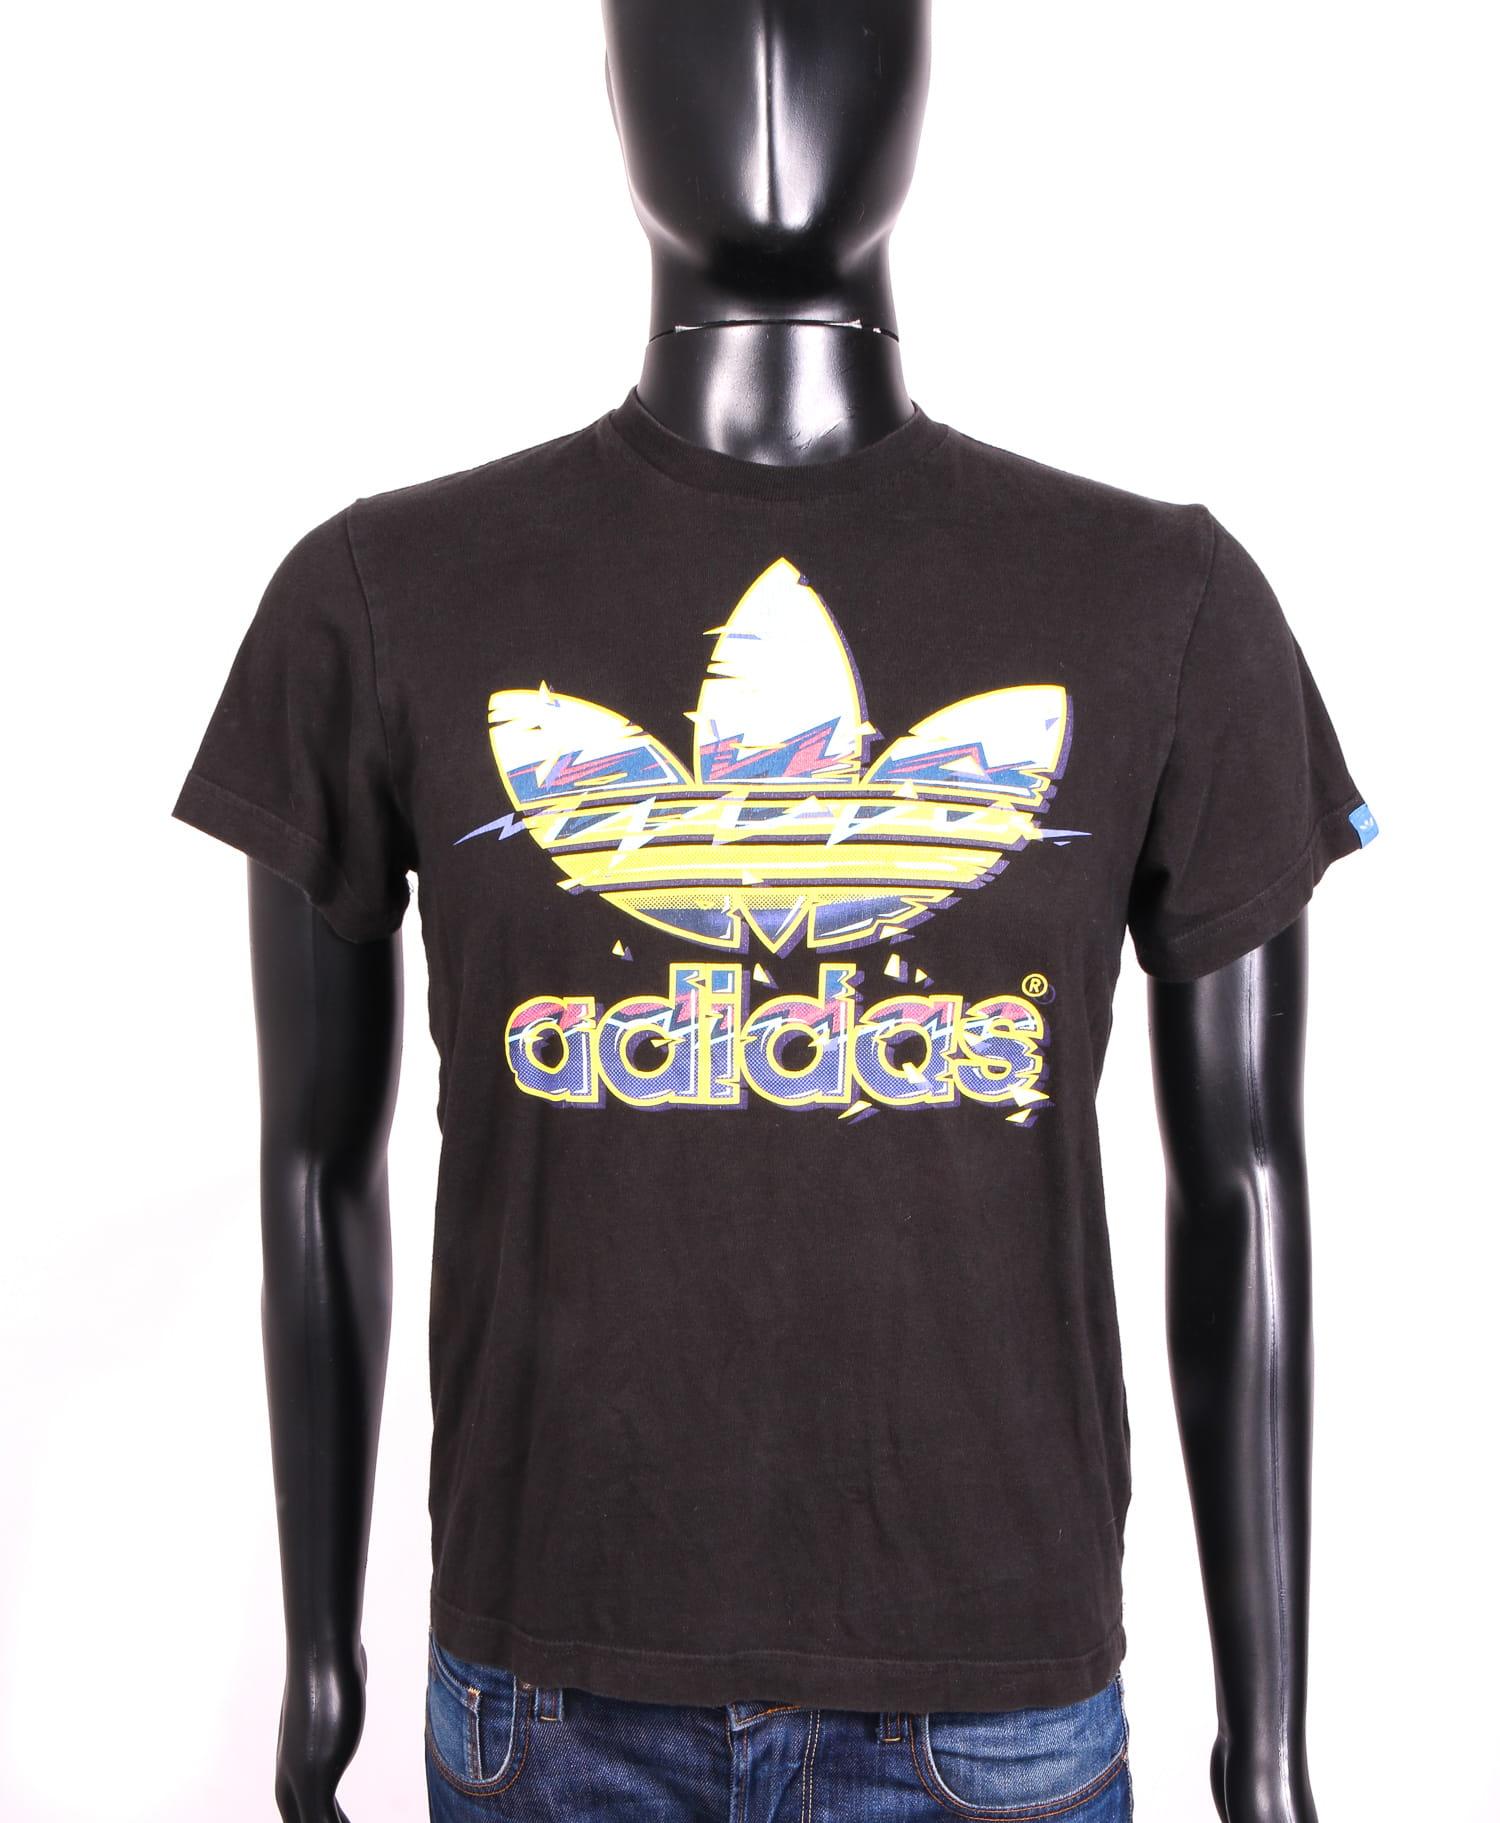 Detalles de Adidas Adicolor Mens T shirt Cotton Black S